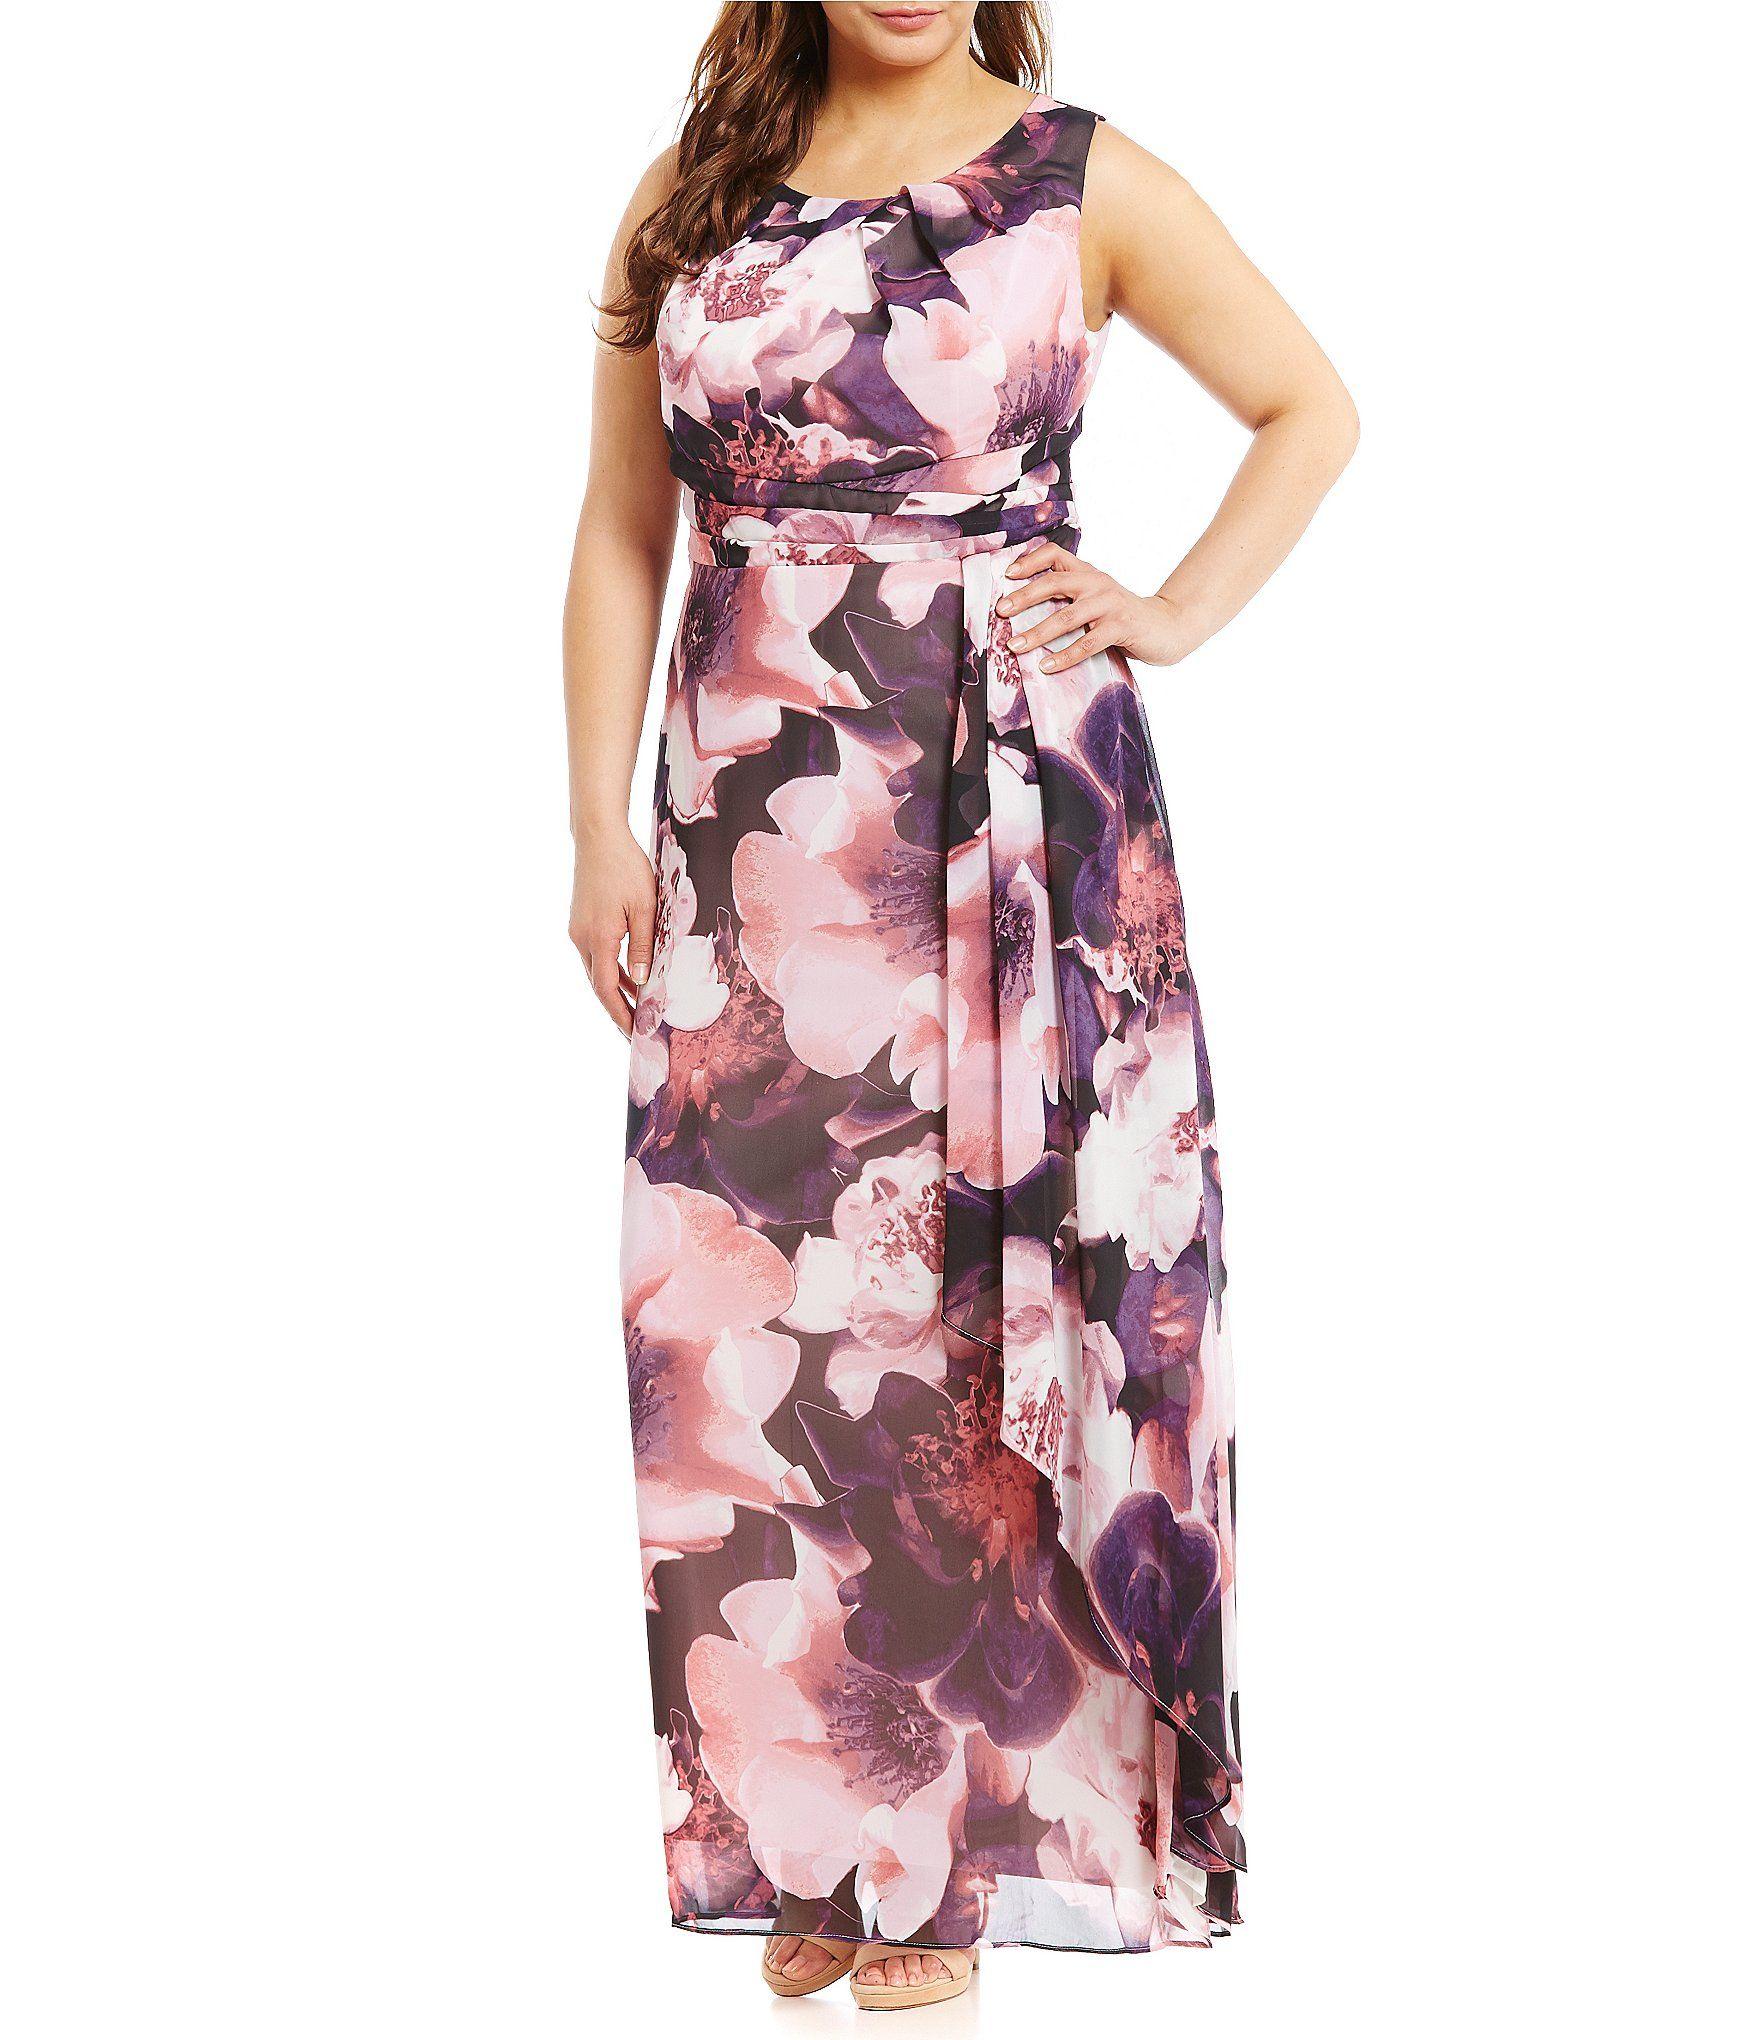 Sangria Plus Printed Chiffon Maxi Dress #Dillards | Clothing ...